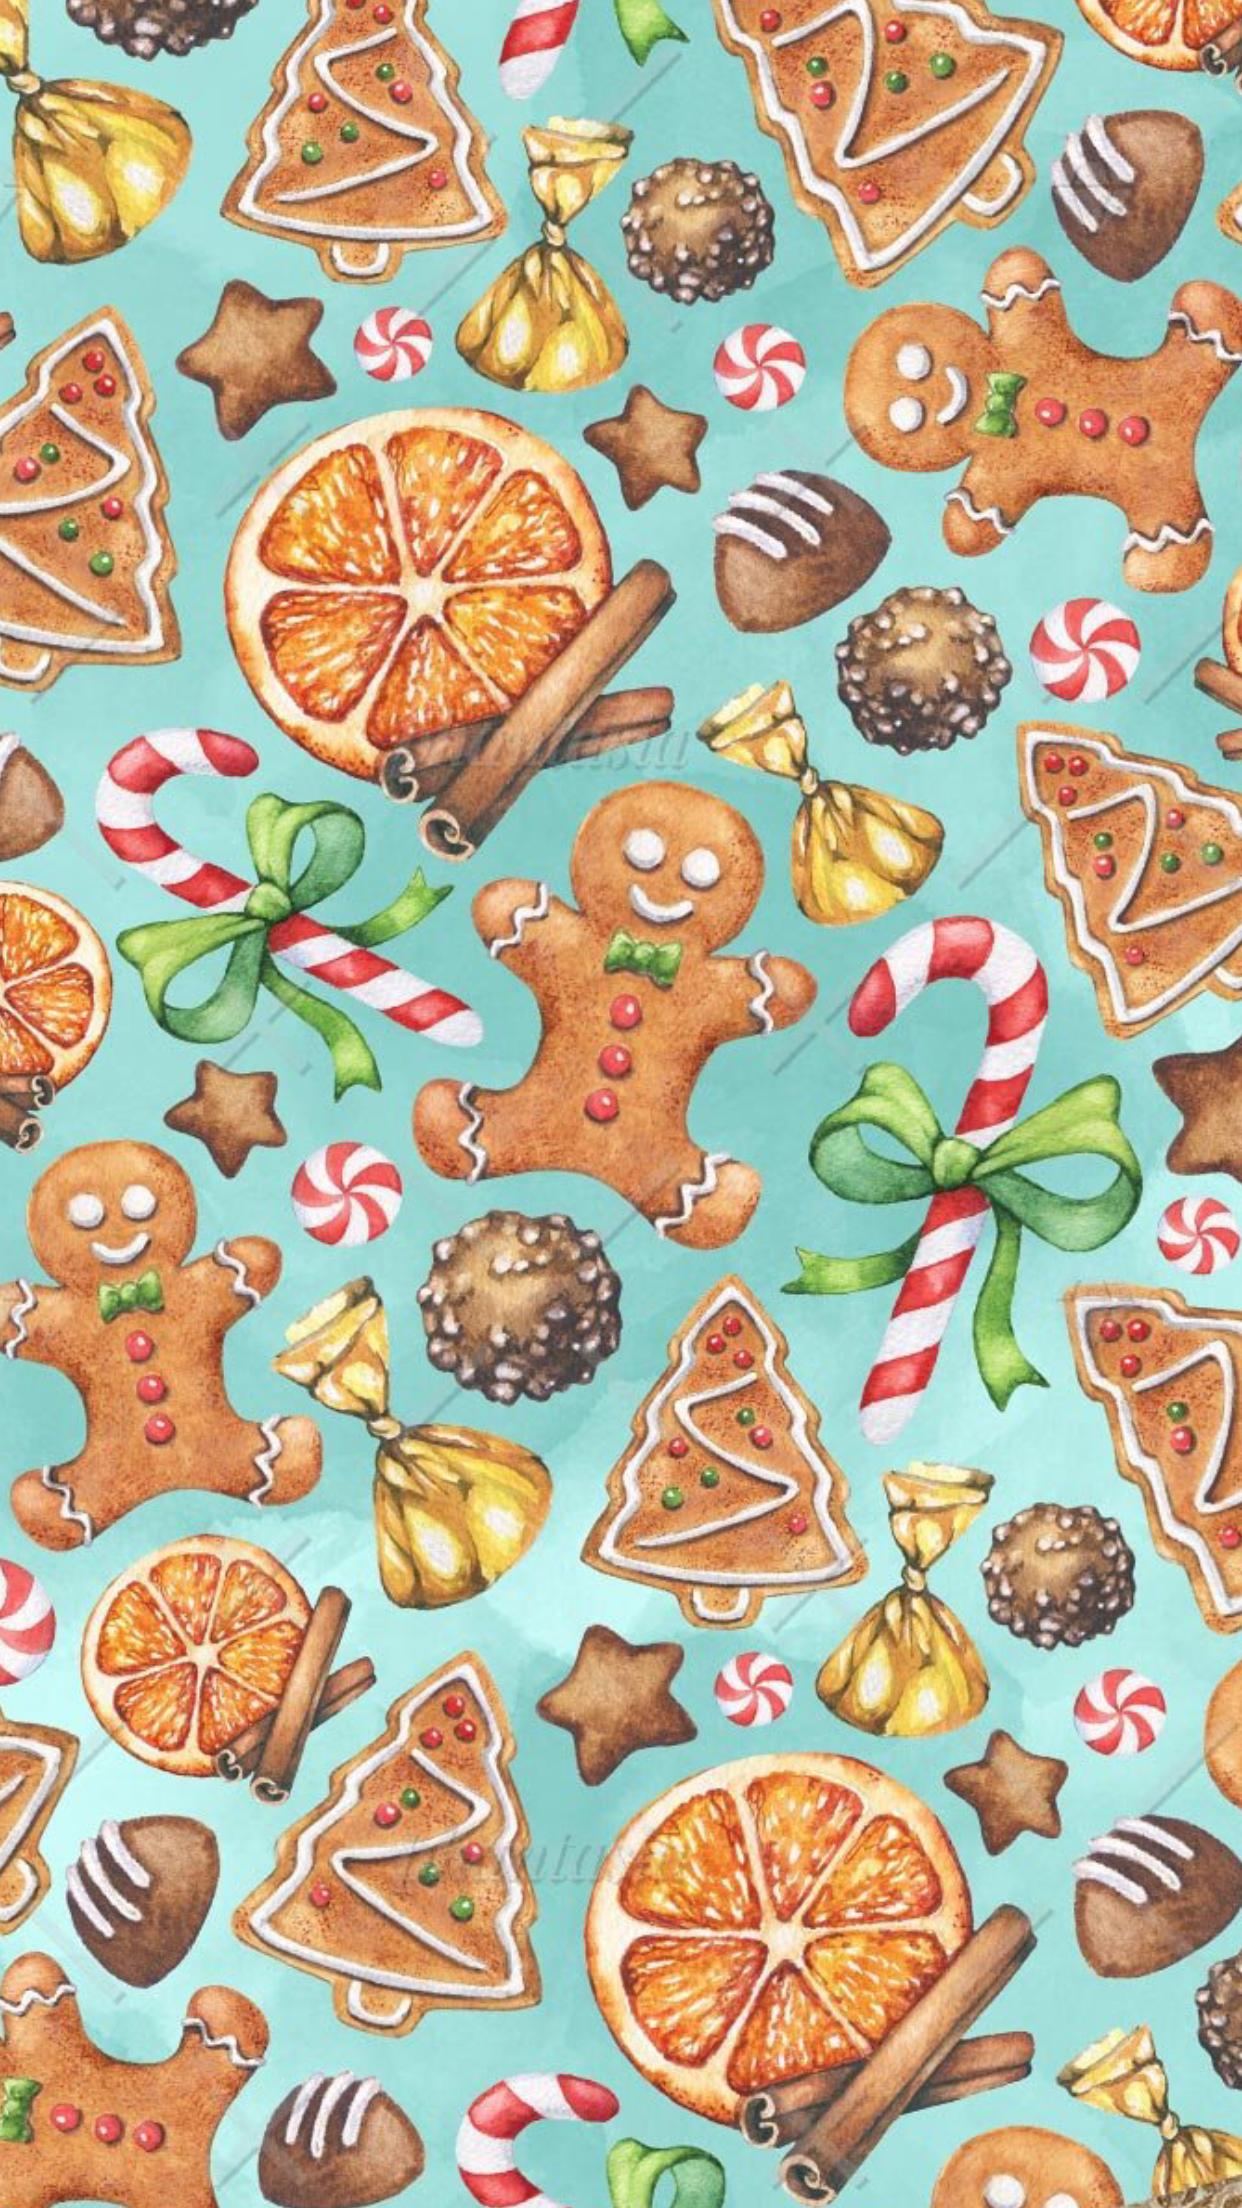 Gingerbread Wallpaper. Winter wallpaper, Christmas